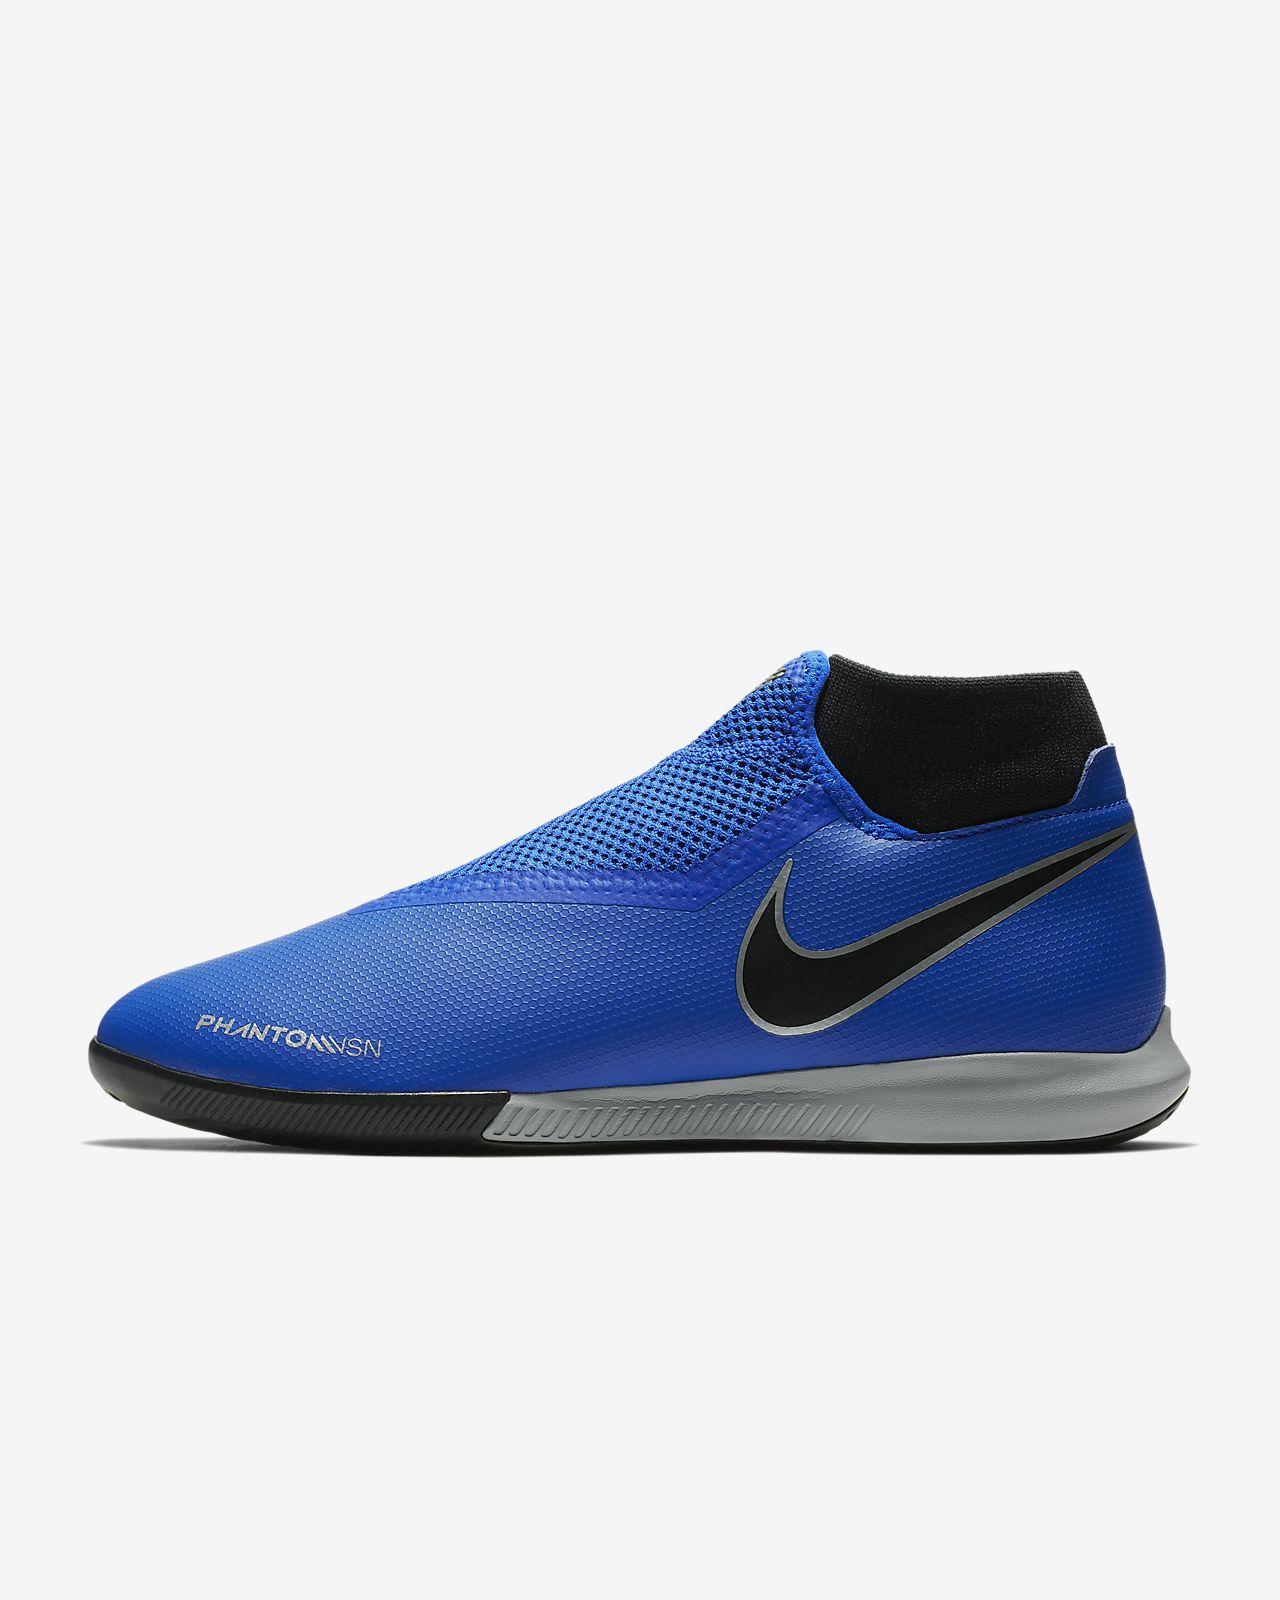 buy popular 7dc70 6ea6c ... Nike Phantom Vision Academy Dynamic Fit Botas de fútbol sala